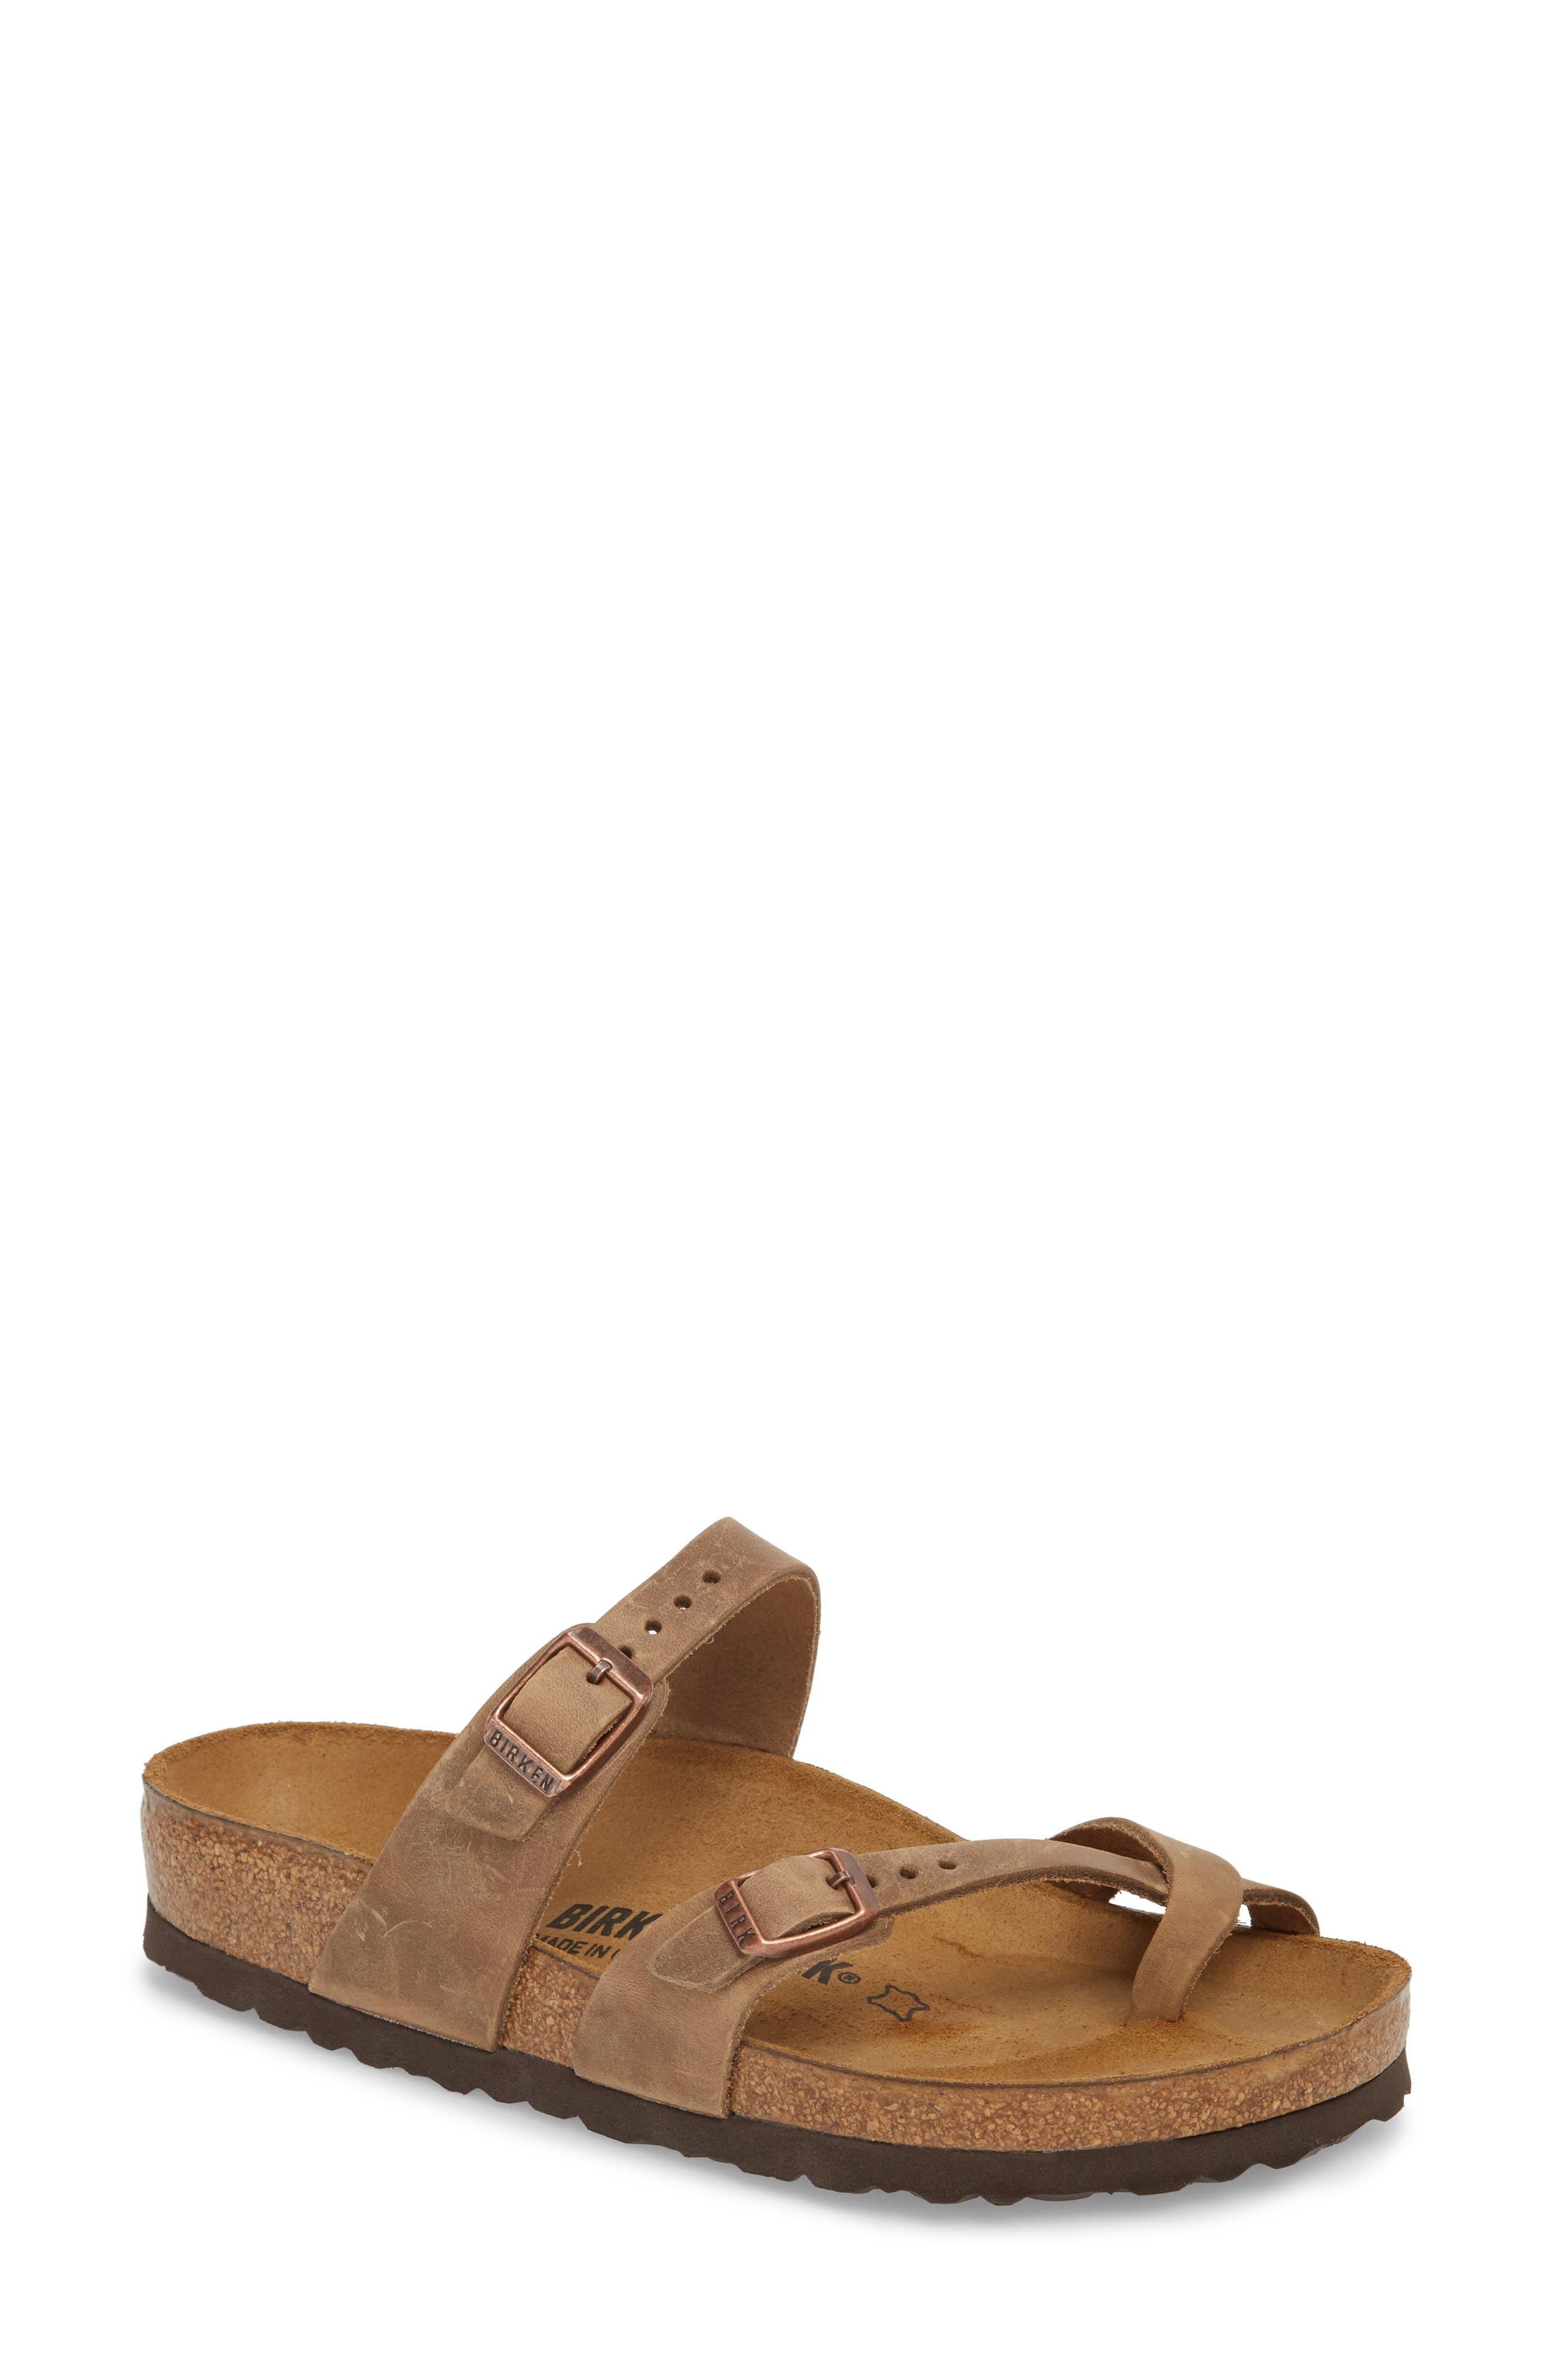 Mayari Slide Sandal,                             Main thumbnail 1, color,                             Tobacco Oiled Leather